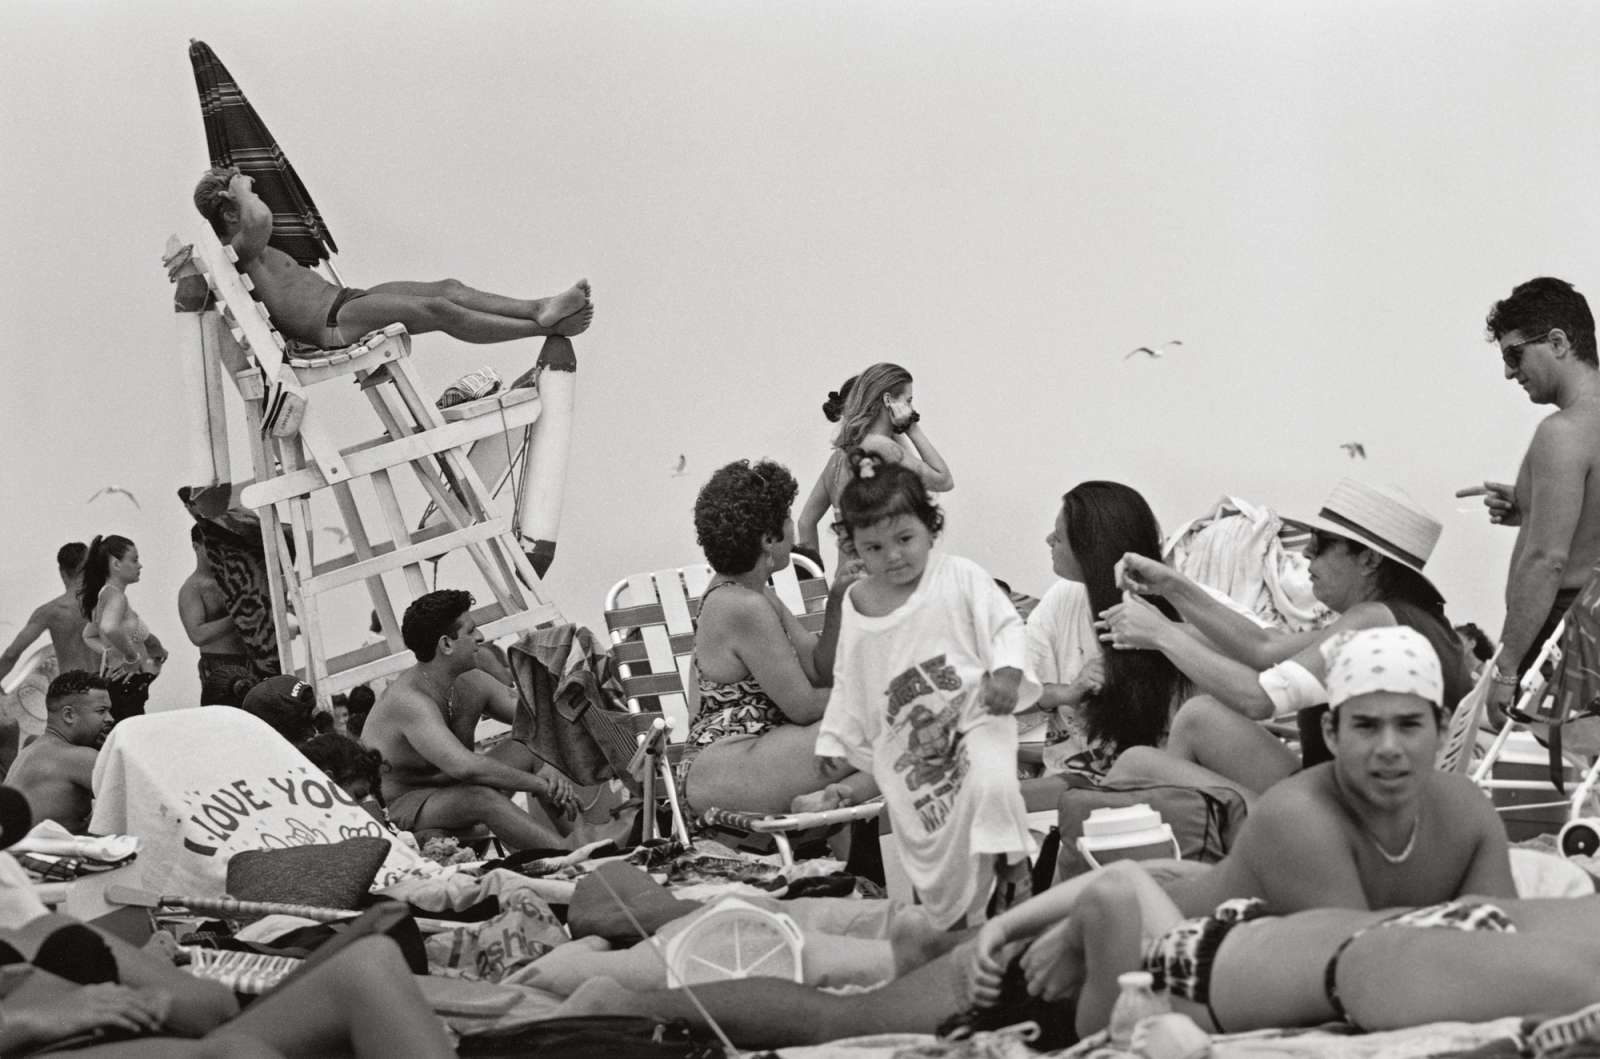 Three Decades of Lifeguards at New York's Jones Beach